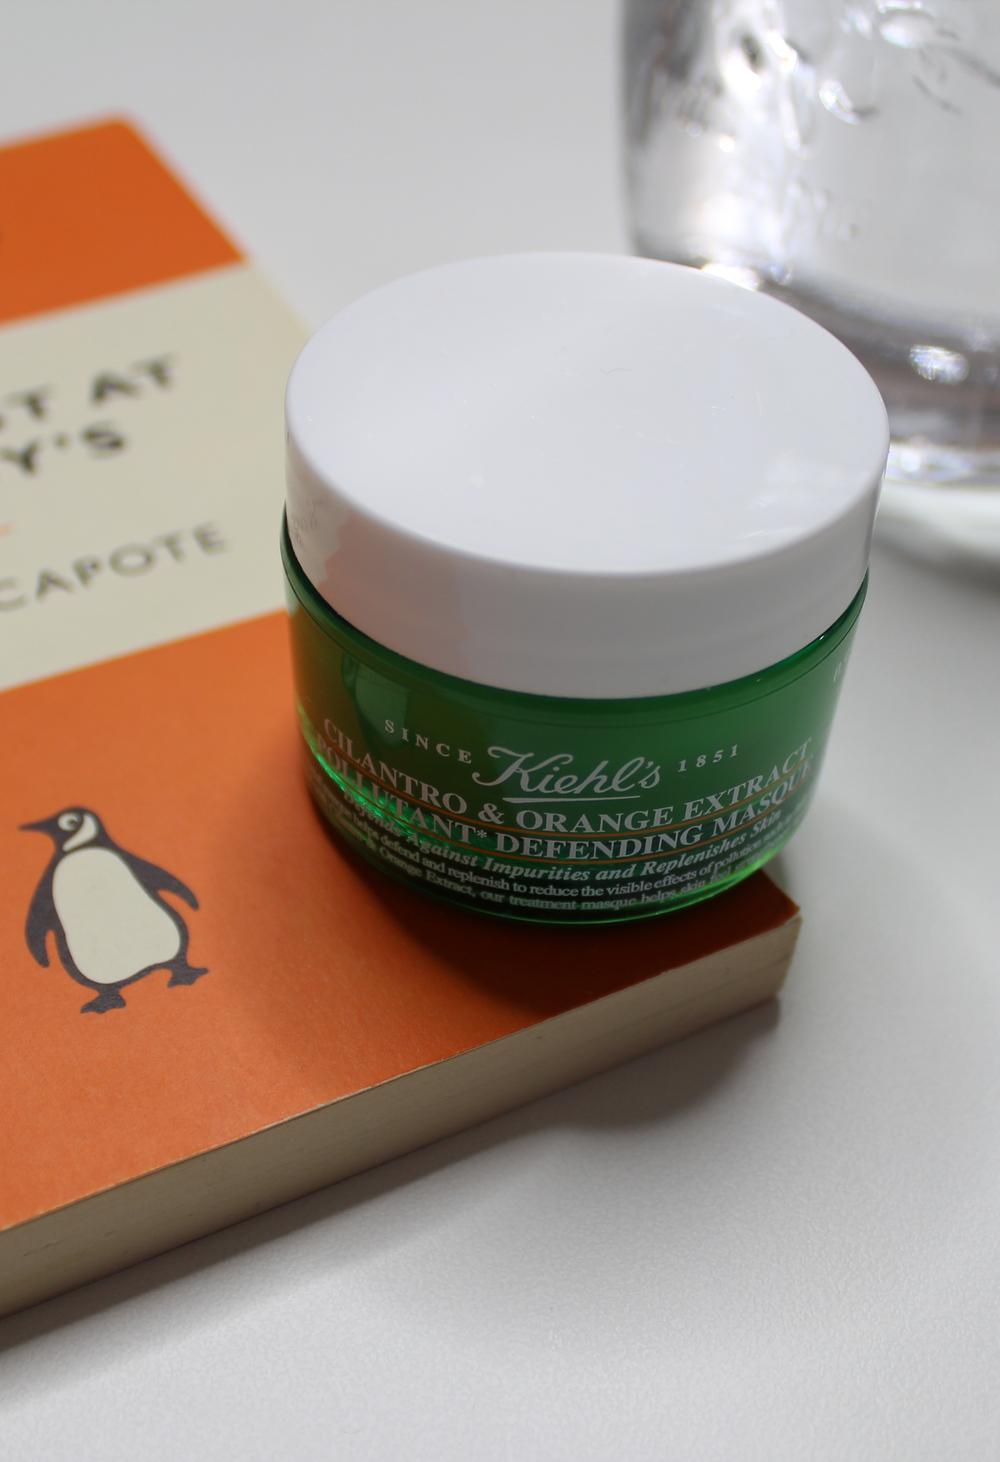 Kiehl's Cilantro & Orange Extract Pollutant Defending Masque | Emma Louisa